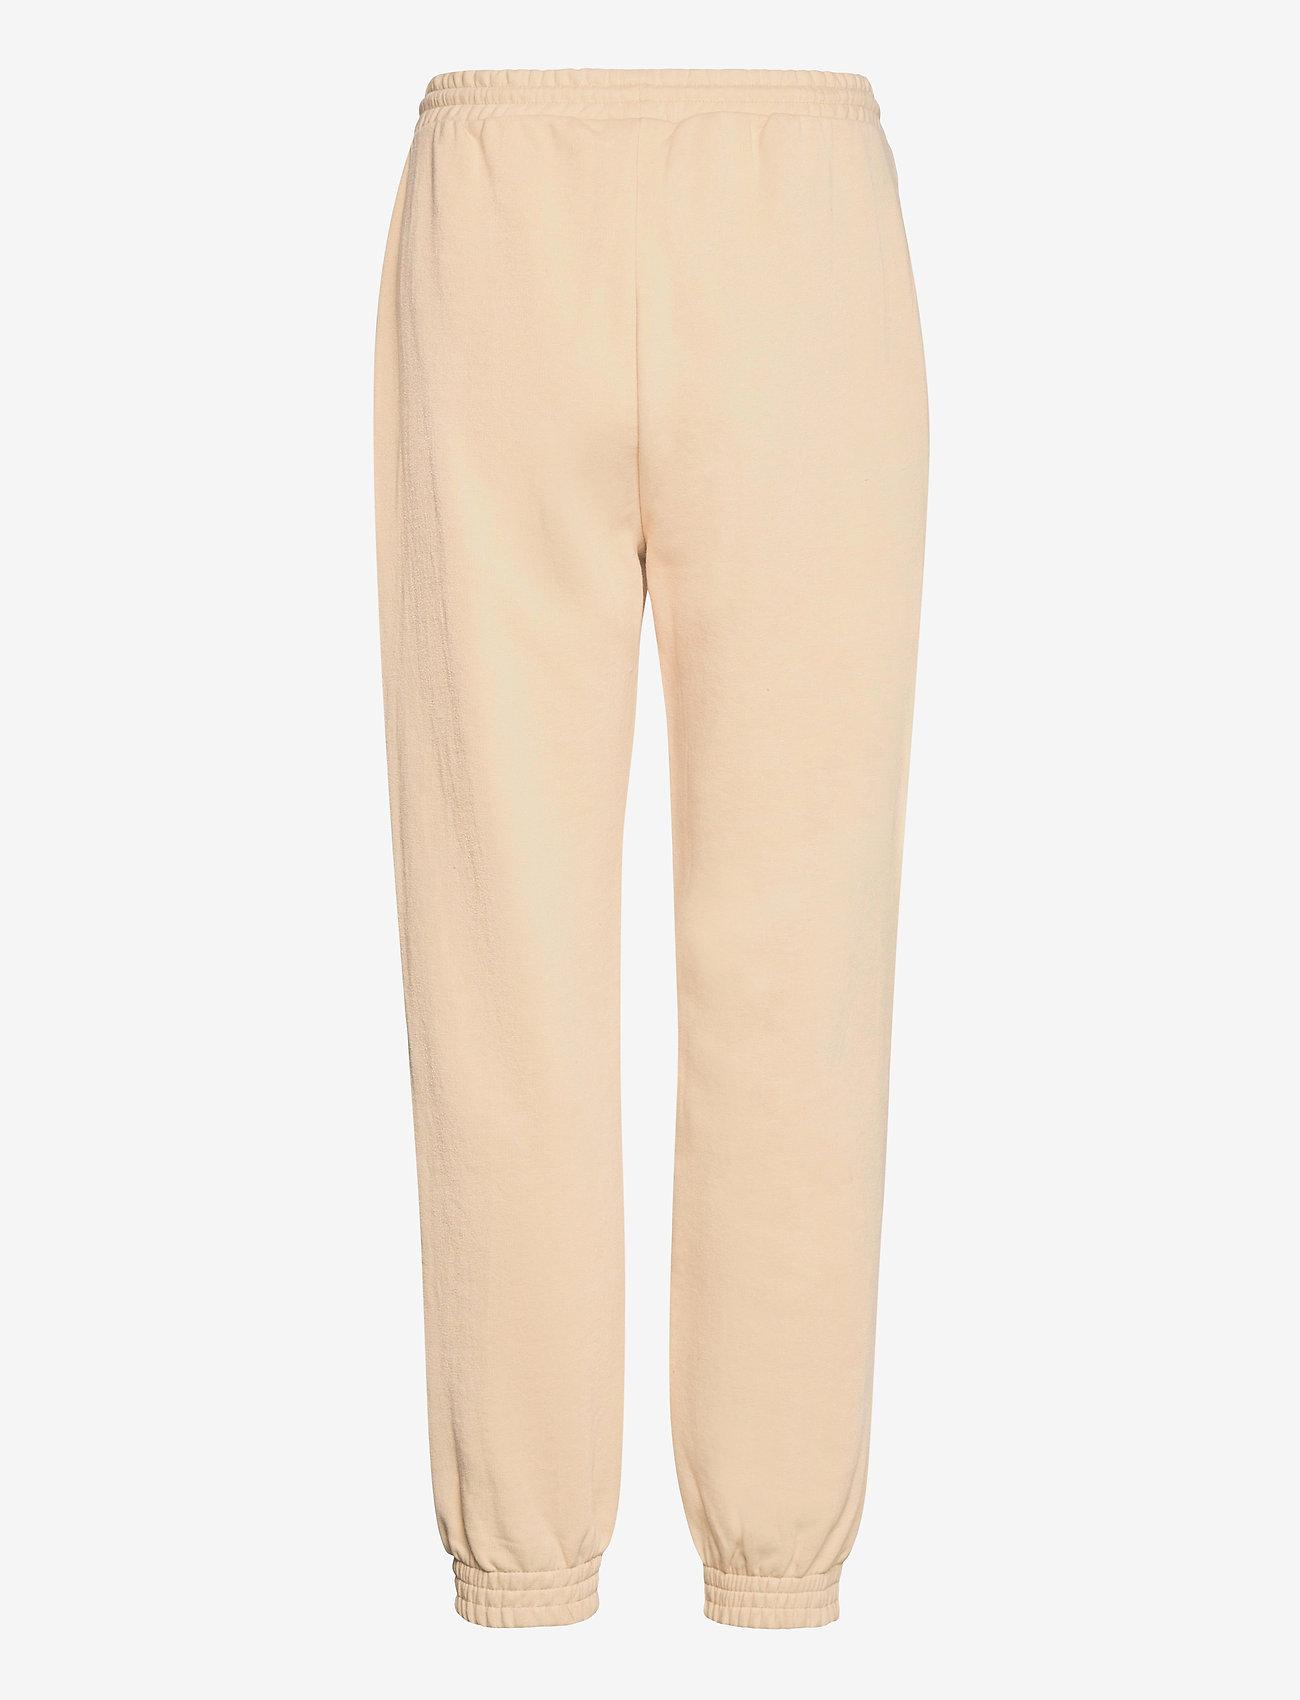 Modström - Holly pants - sweatpants - cream milk - 1